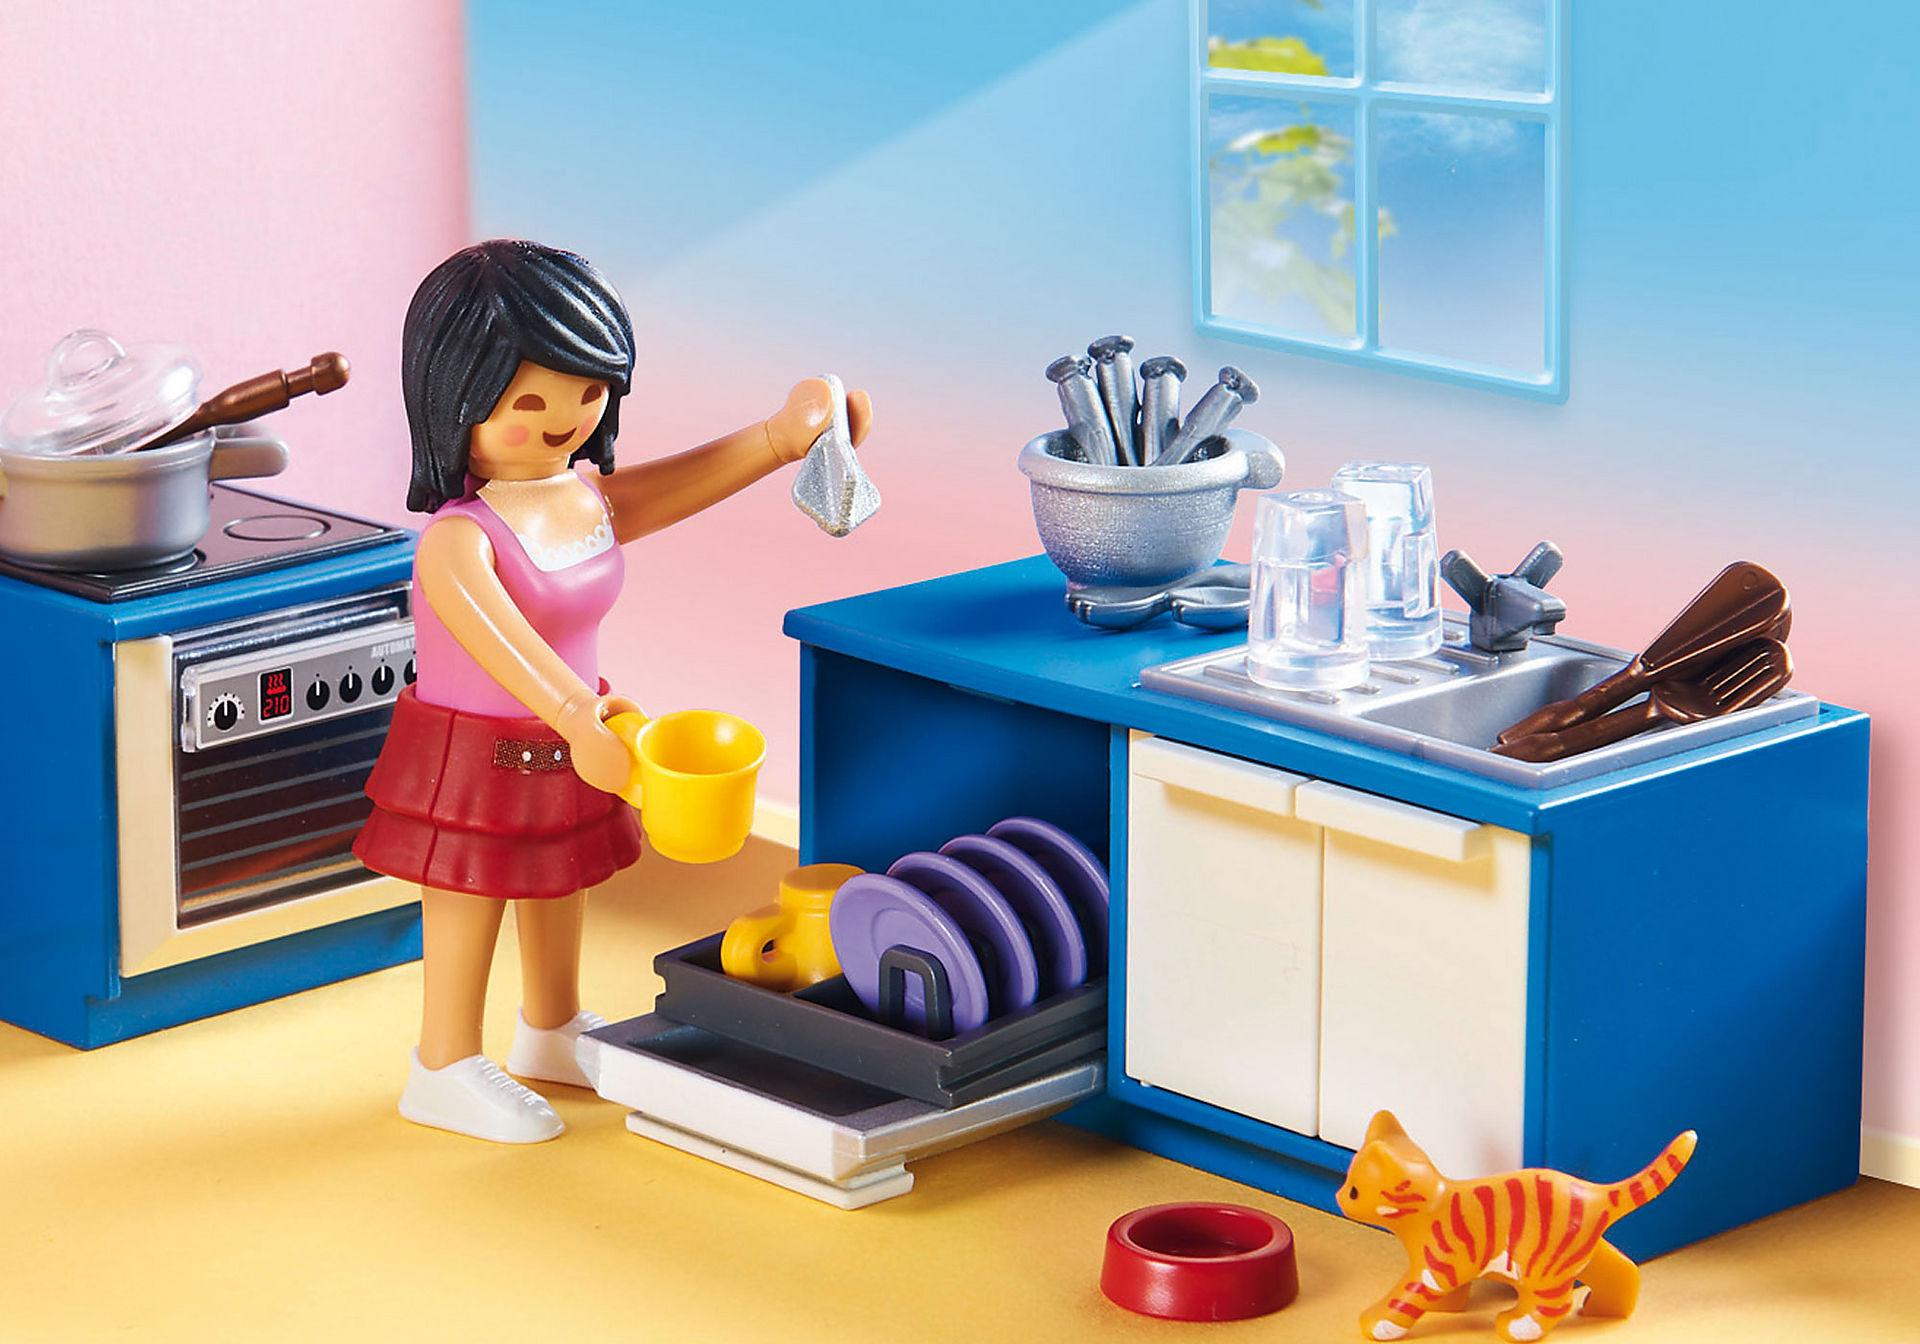 70206 Family Kitchen zoom image6